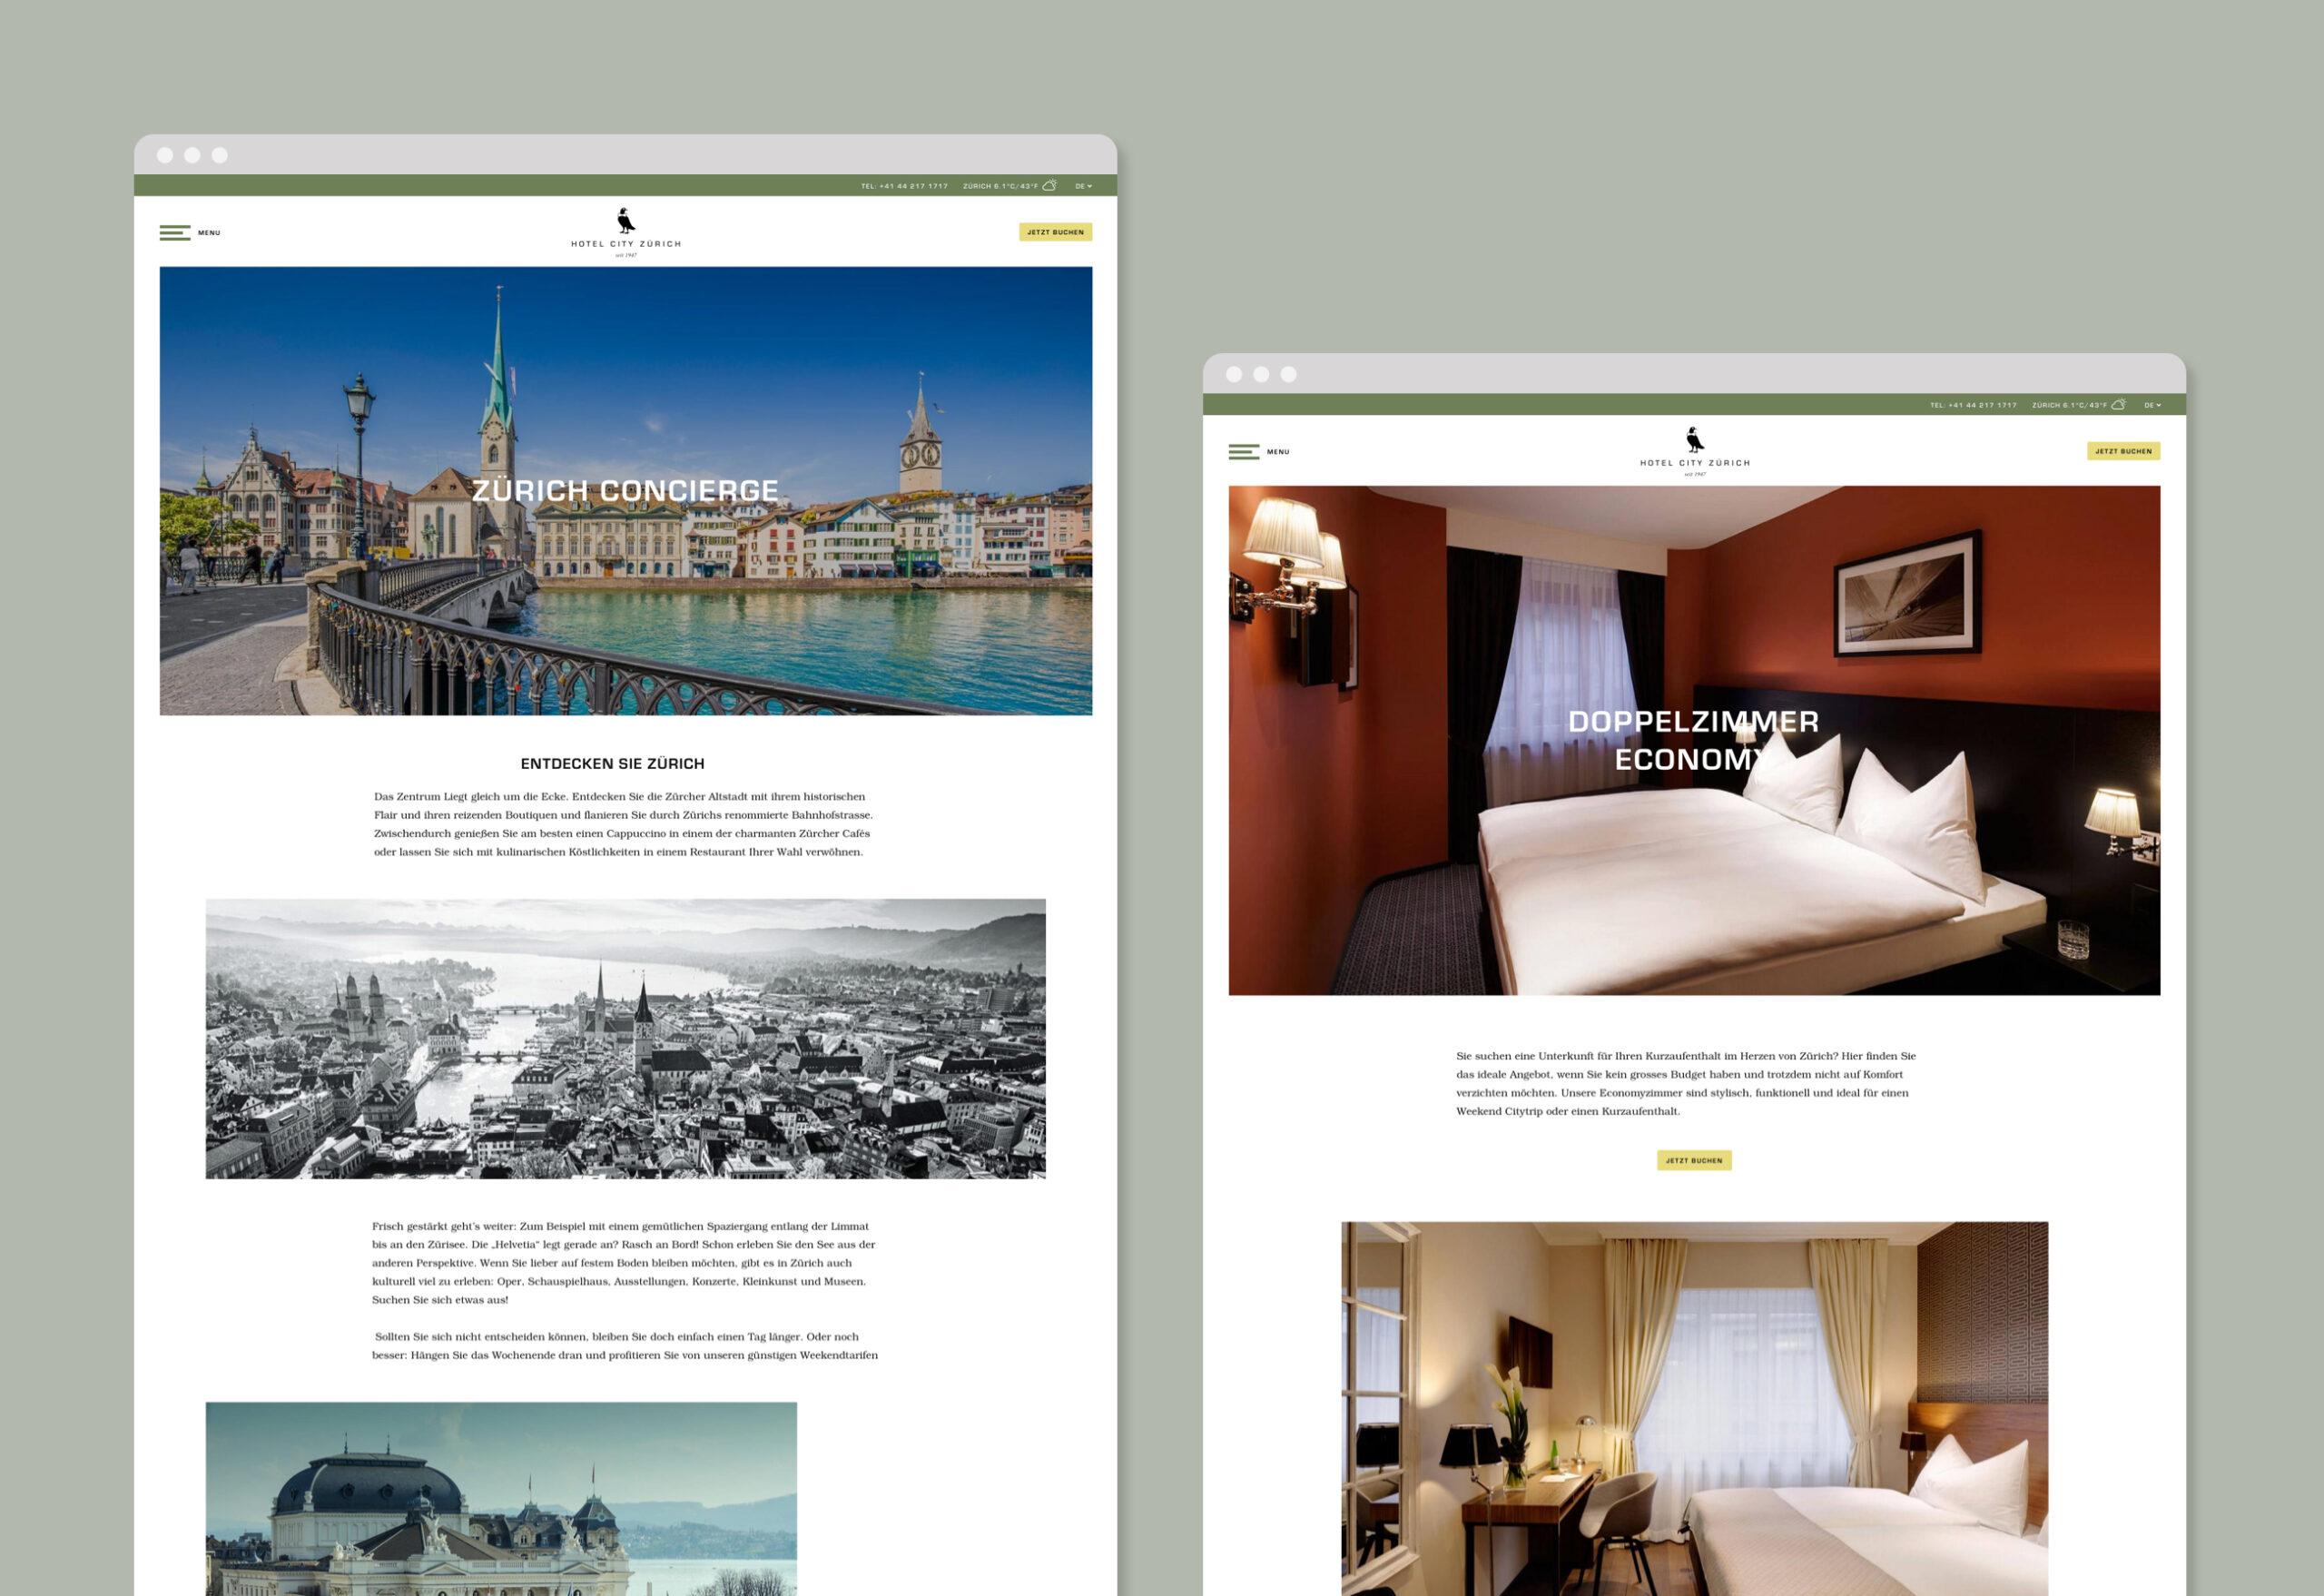 Hotel City Zurich website screenshots